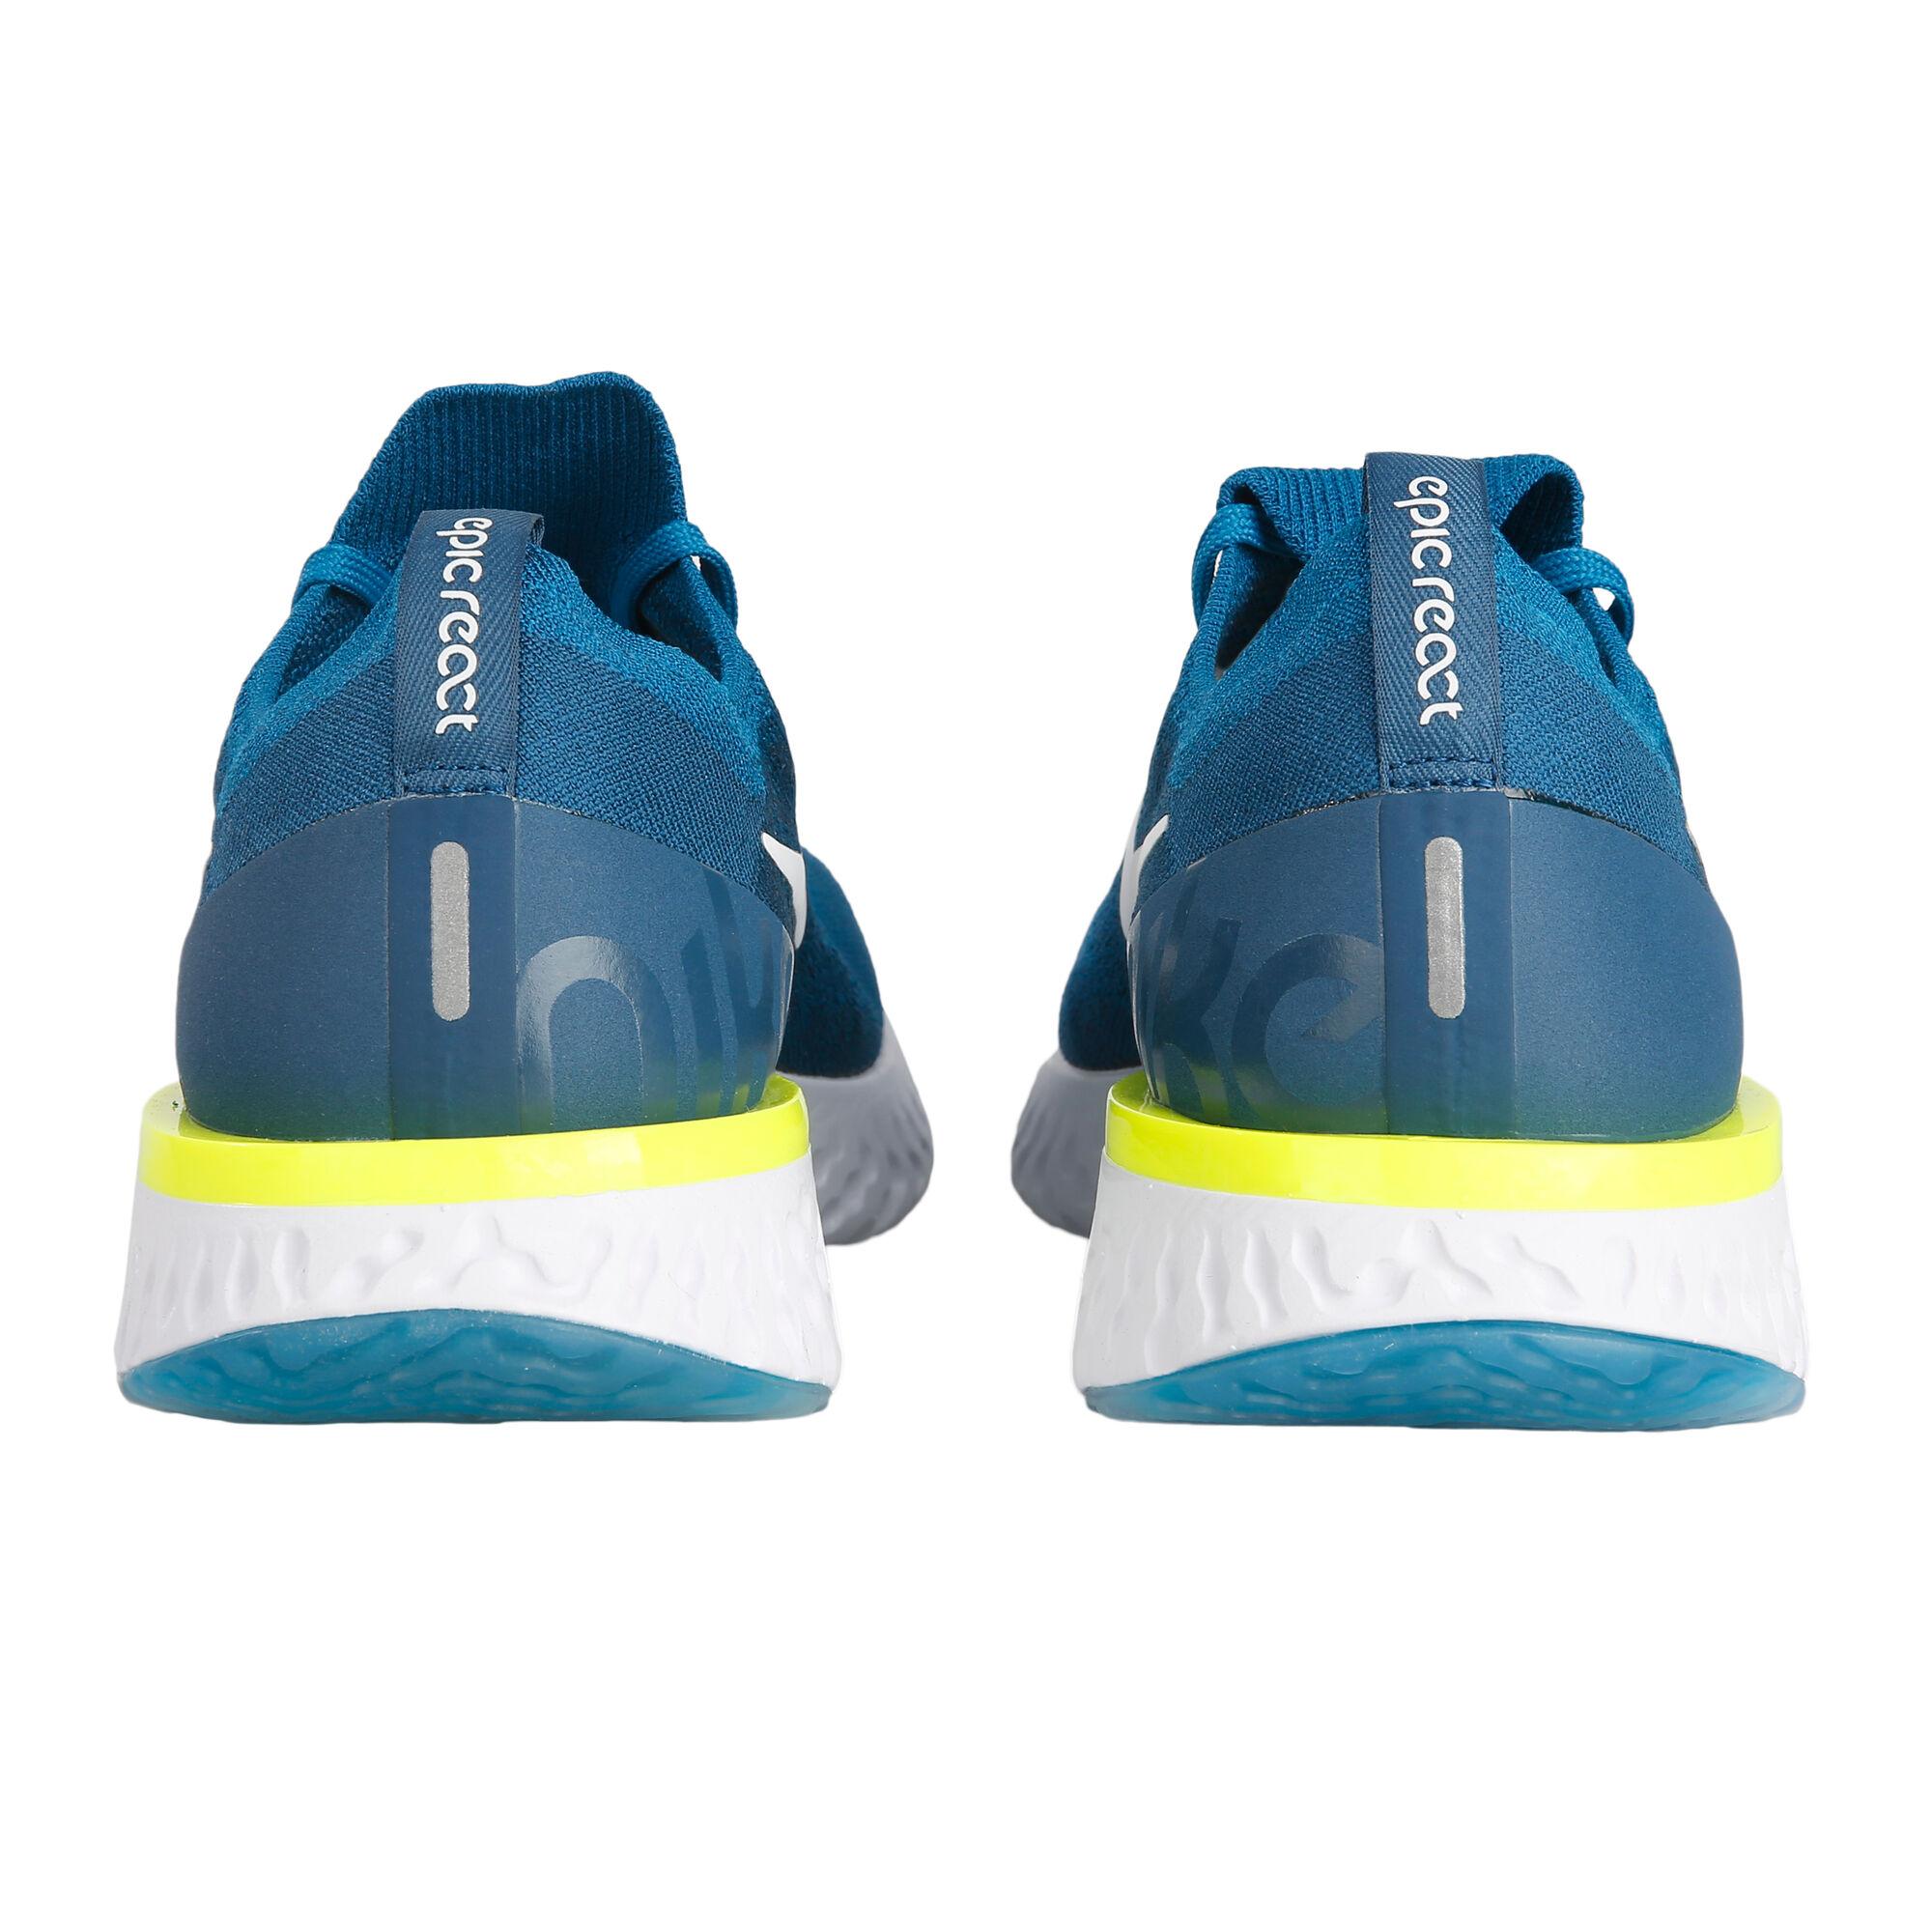 online store 12fa8 a2f81 ... Nike · Nike · Nike · Nike. Epic React Flyknit Men ...